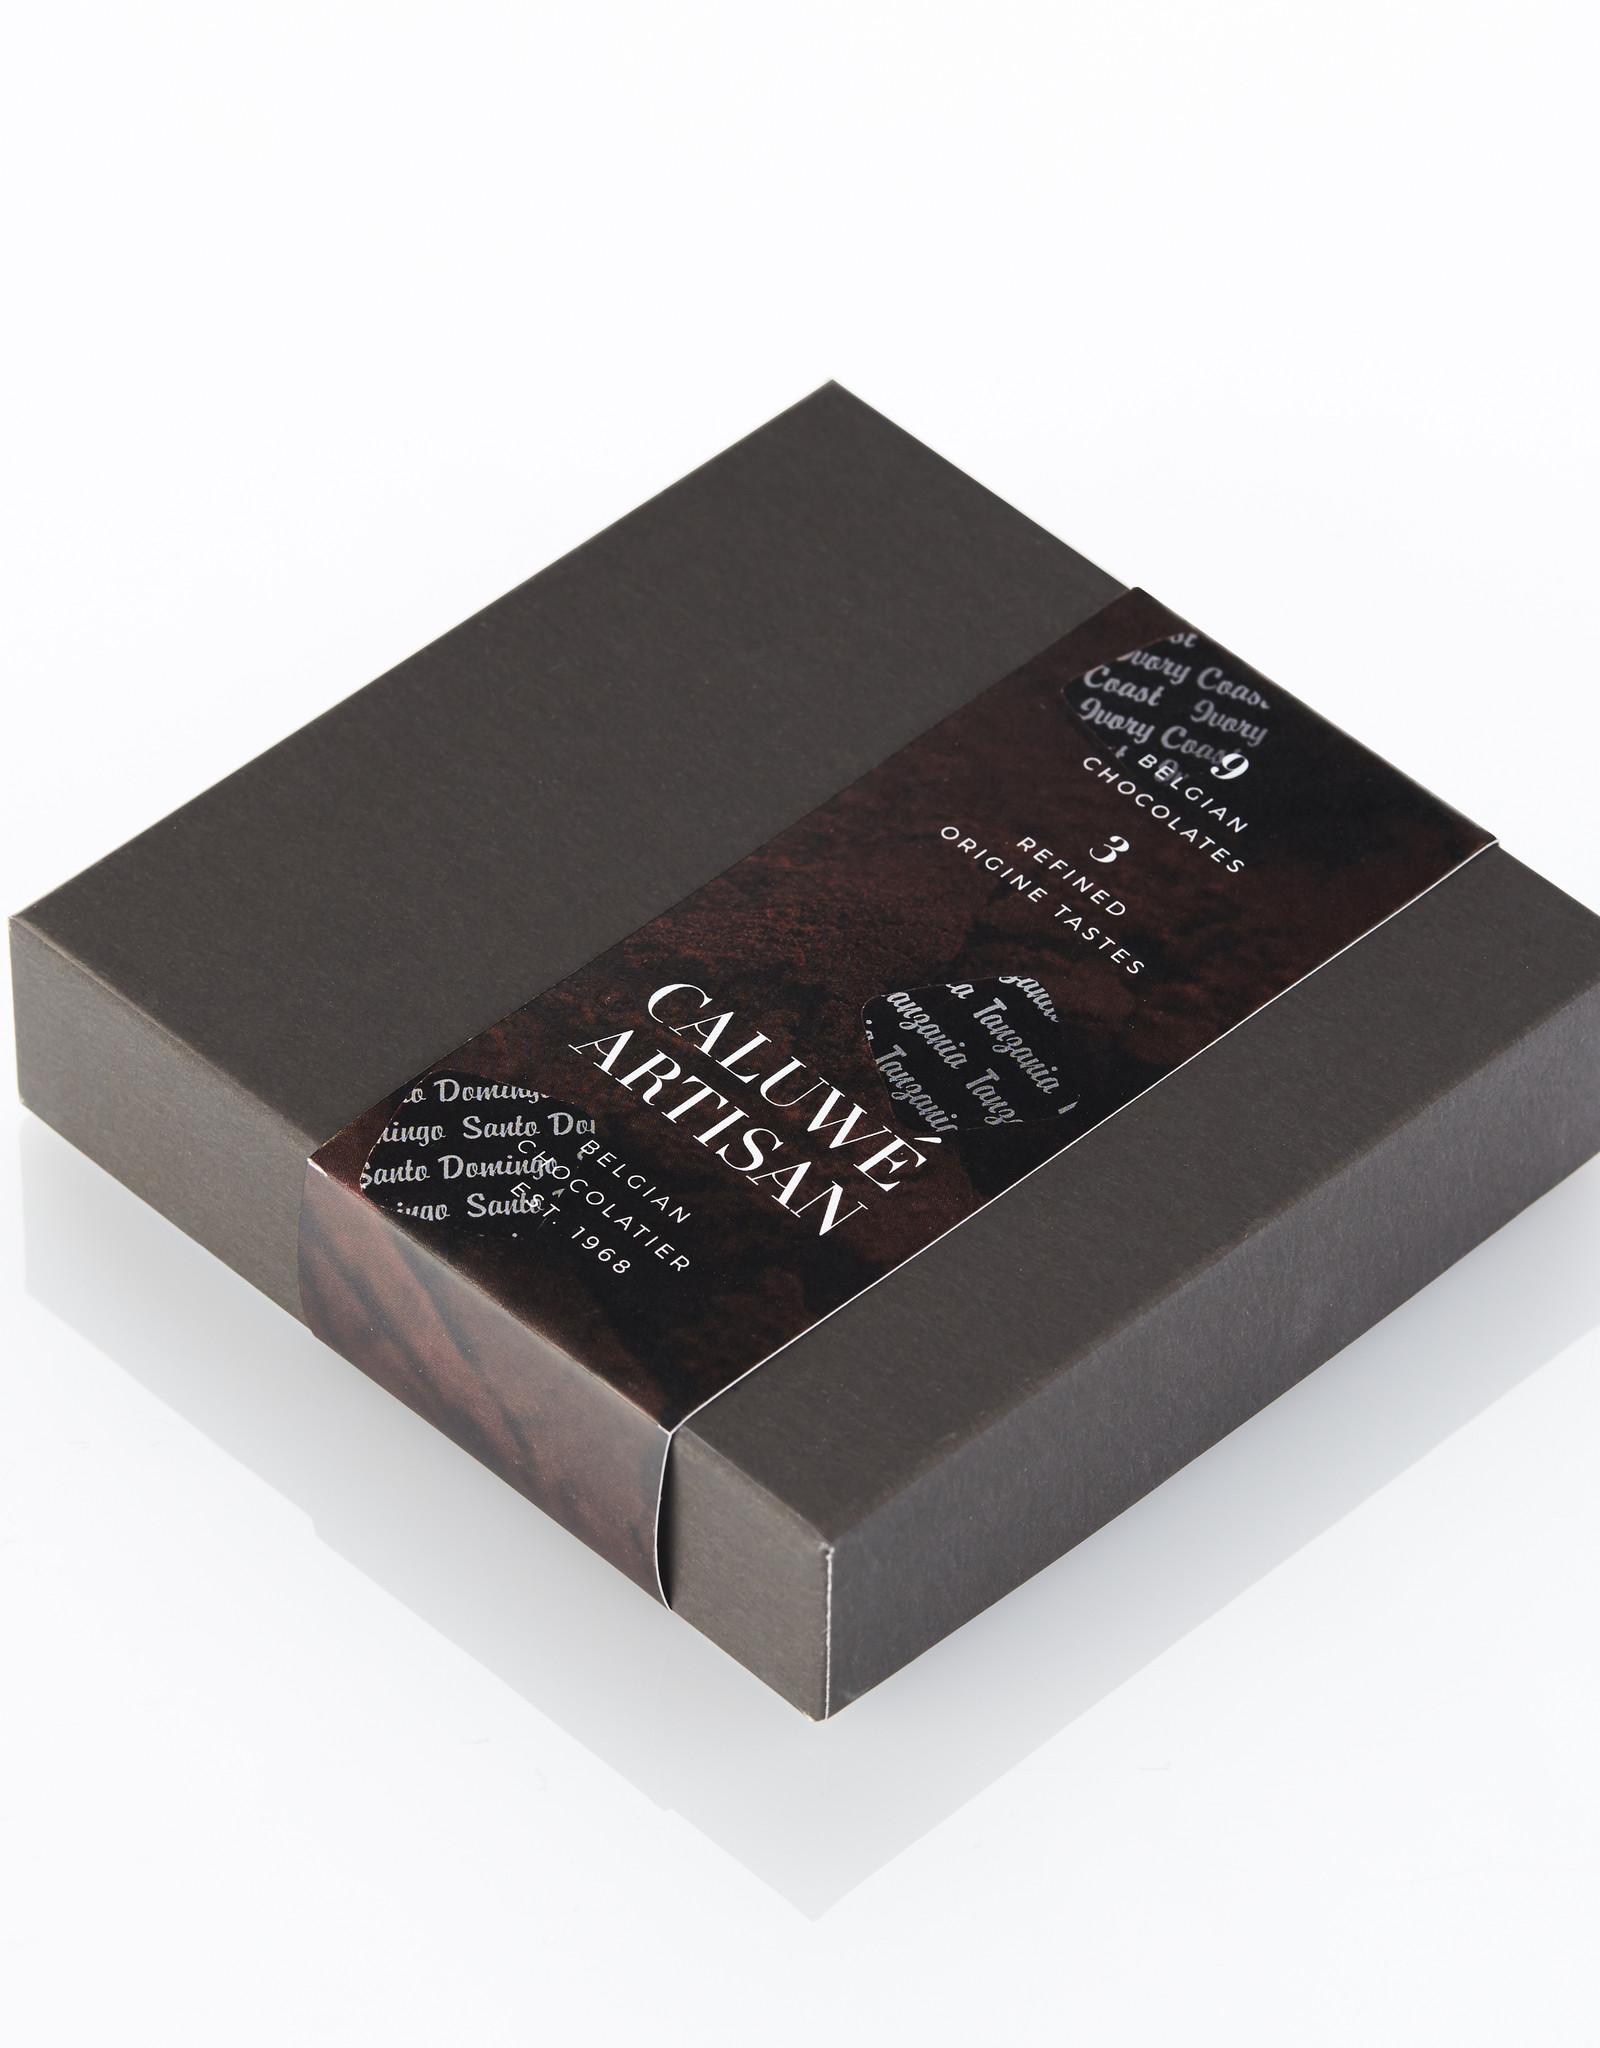 Caluwe Artisan Assortiment de 9 chocolats Belges rempli 95g